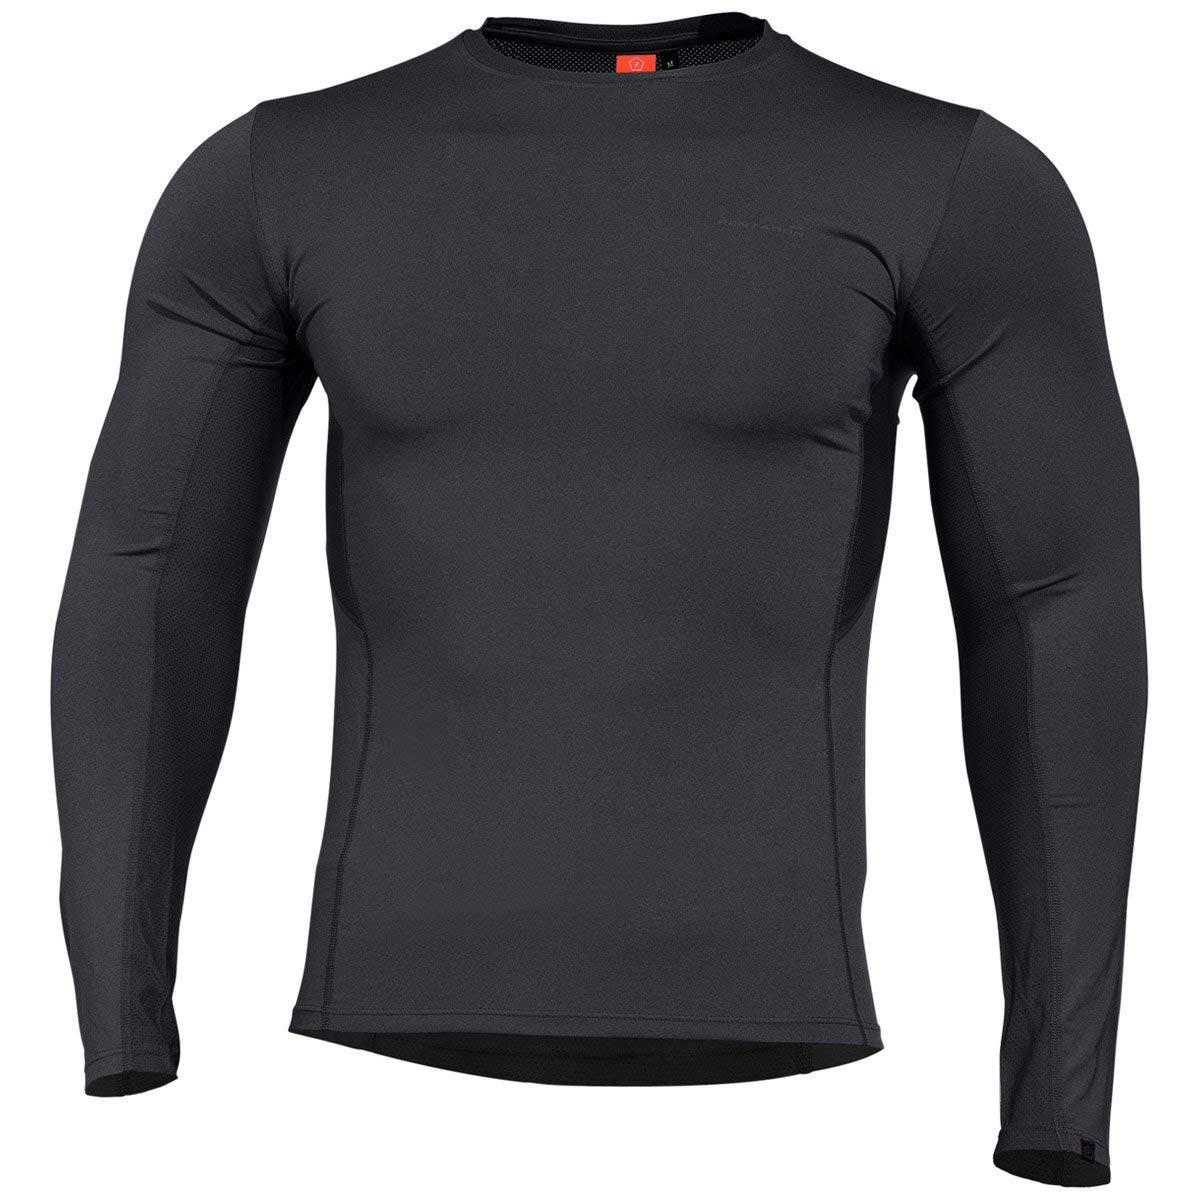 Pentagon Men s Apollo Tac Fresh Activity Shirt Black c00682b1102